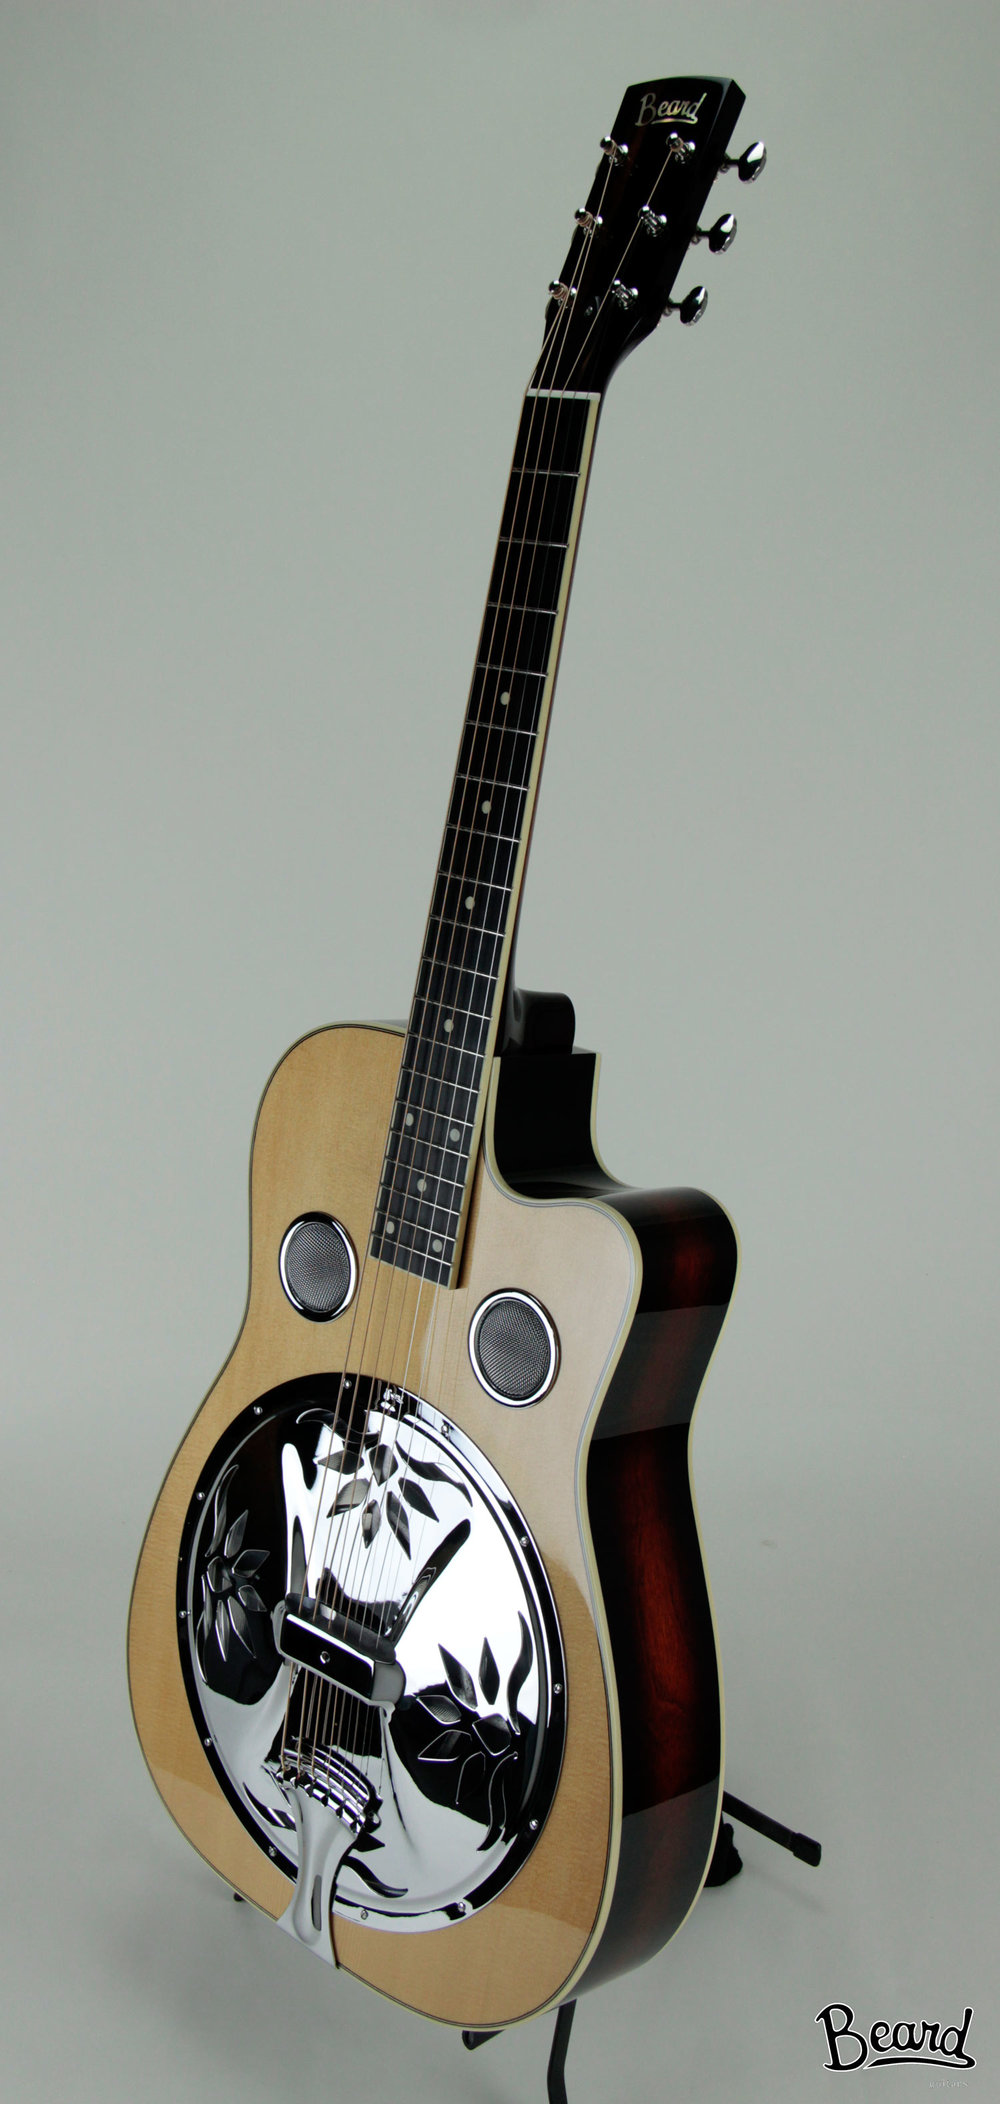 E-Model-Custom-CTWY-Spruce-Birch-Burst-FS.jpg